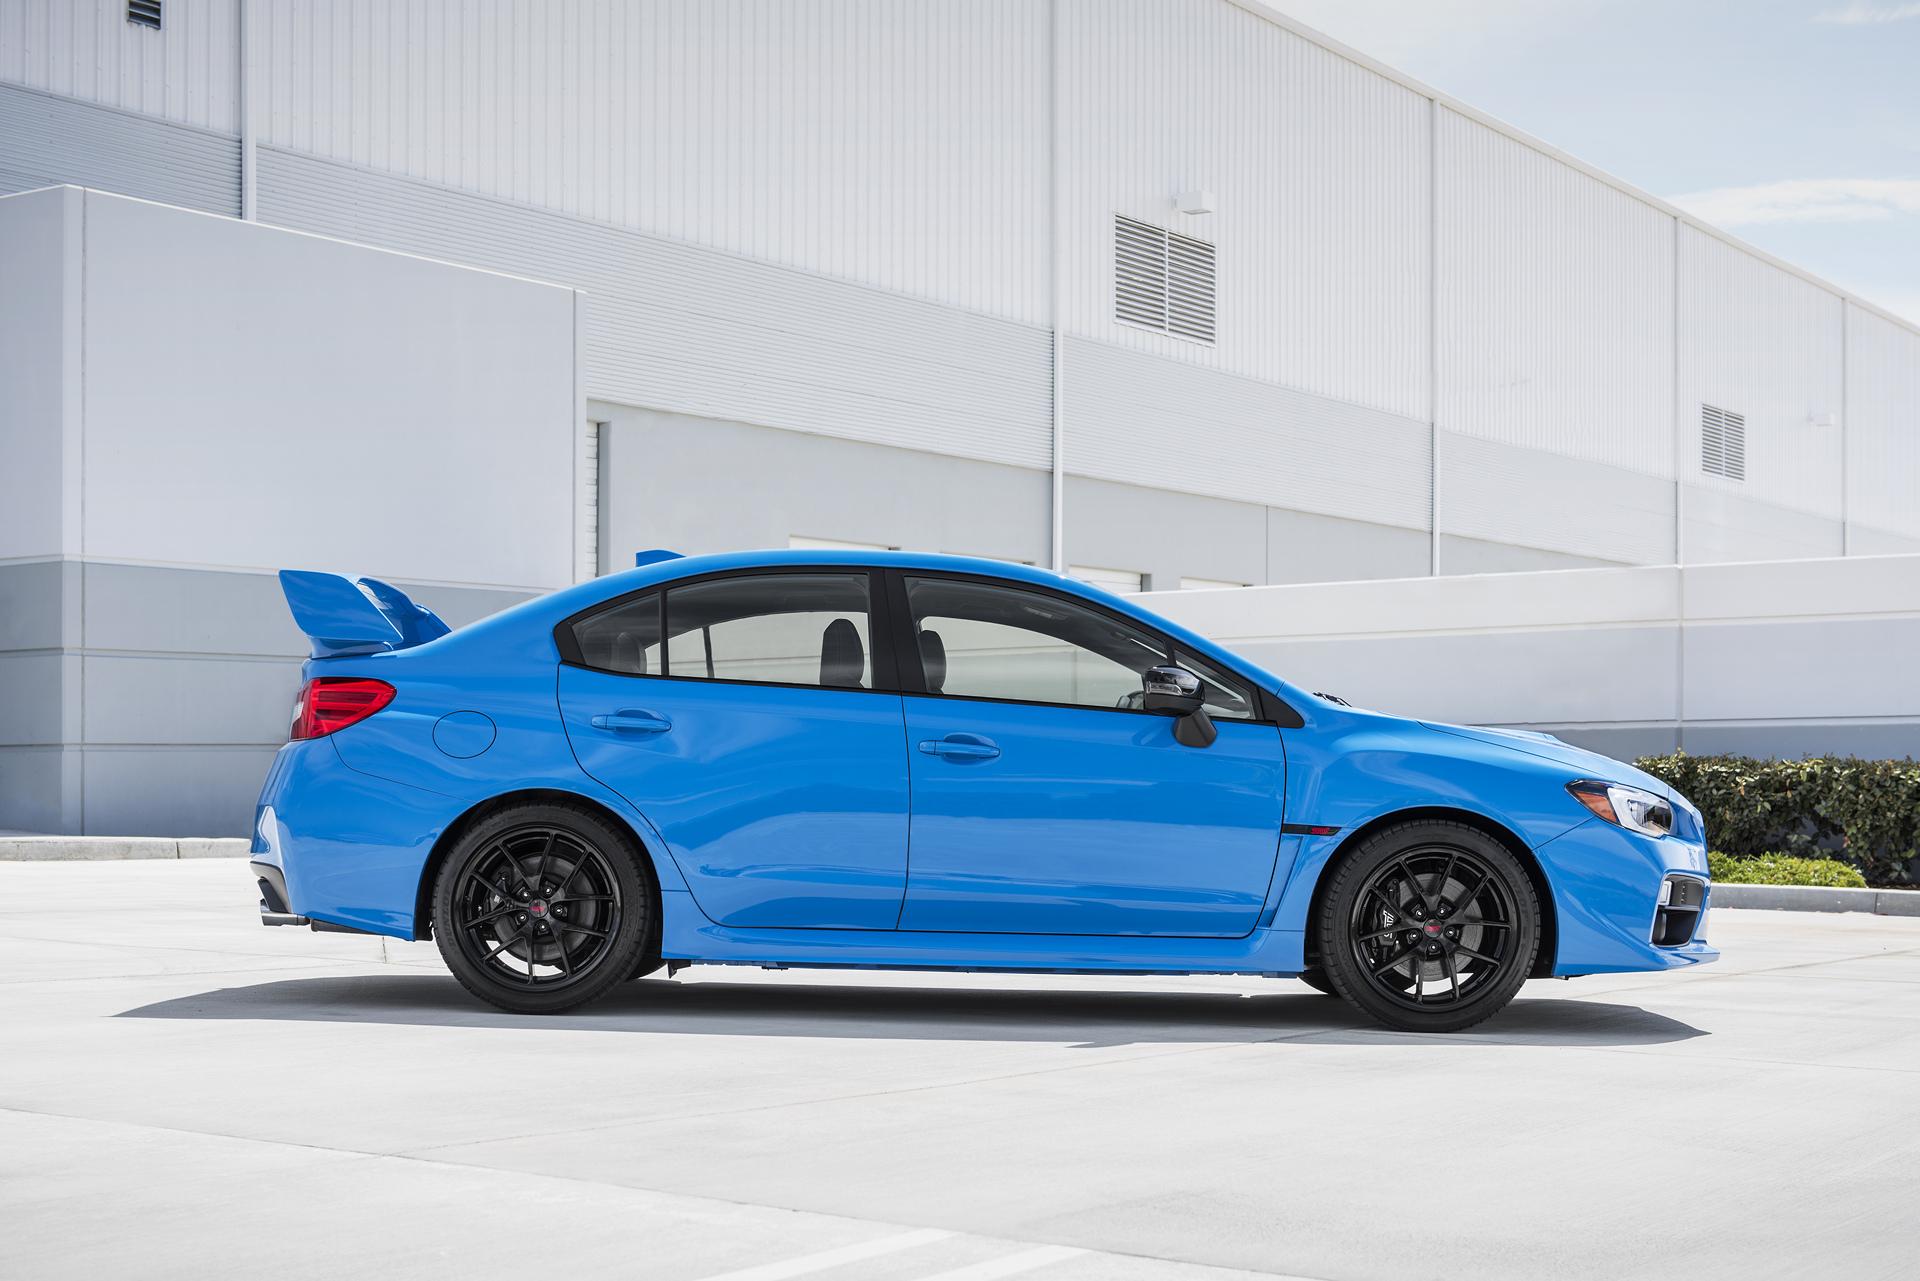 2016 Subaru Wrx Sti Review Carrrs Auto Portal Blue With White Rims Hyperblue Fuji Heavy Industries Ltd